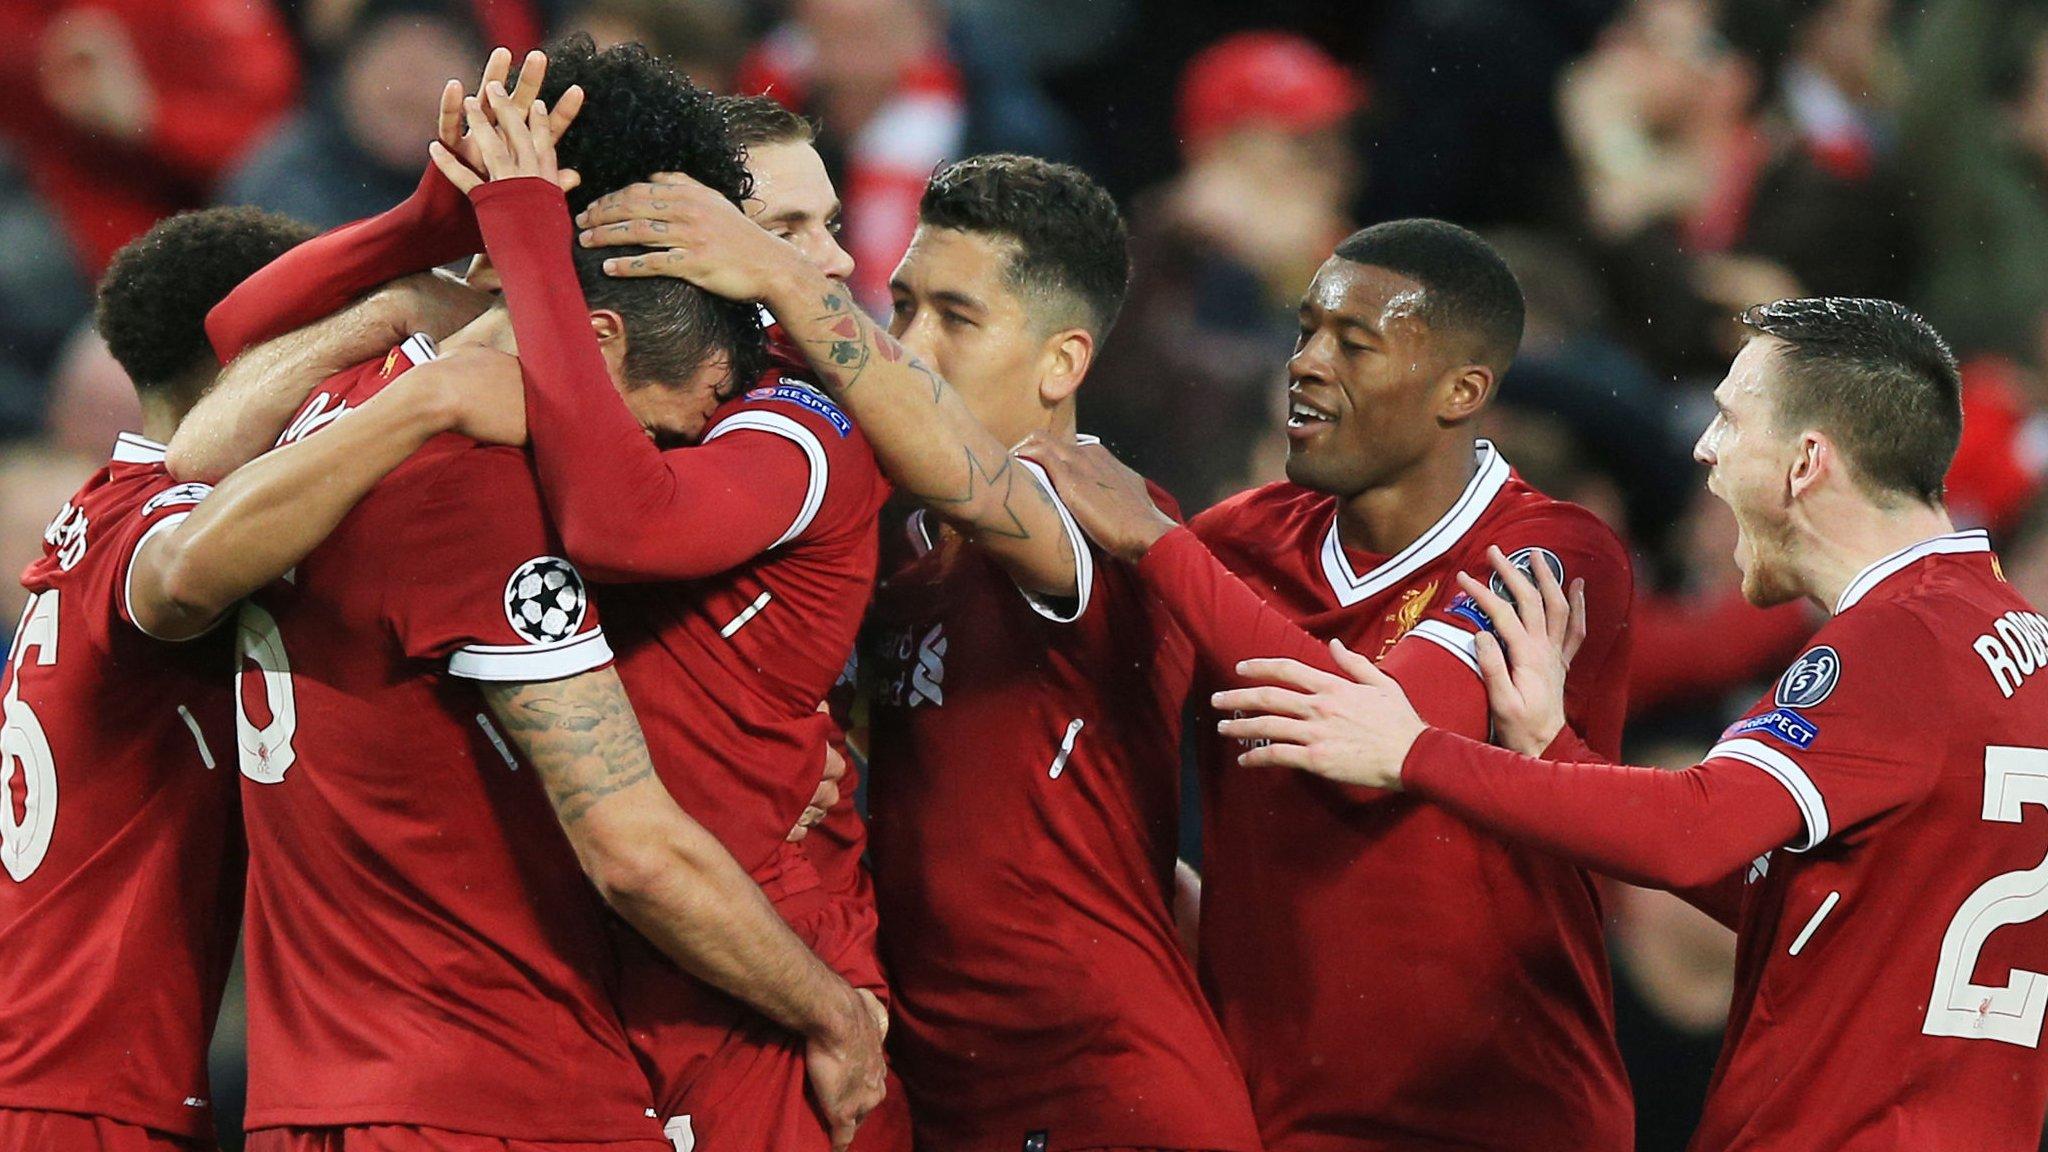 Analysis: Liverpool win unlike any football I've seen before - Lawrenson